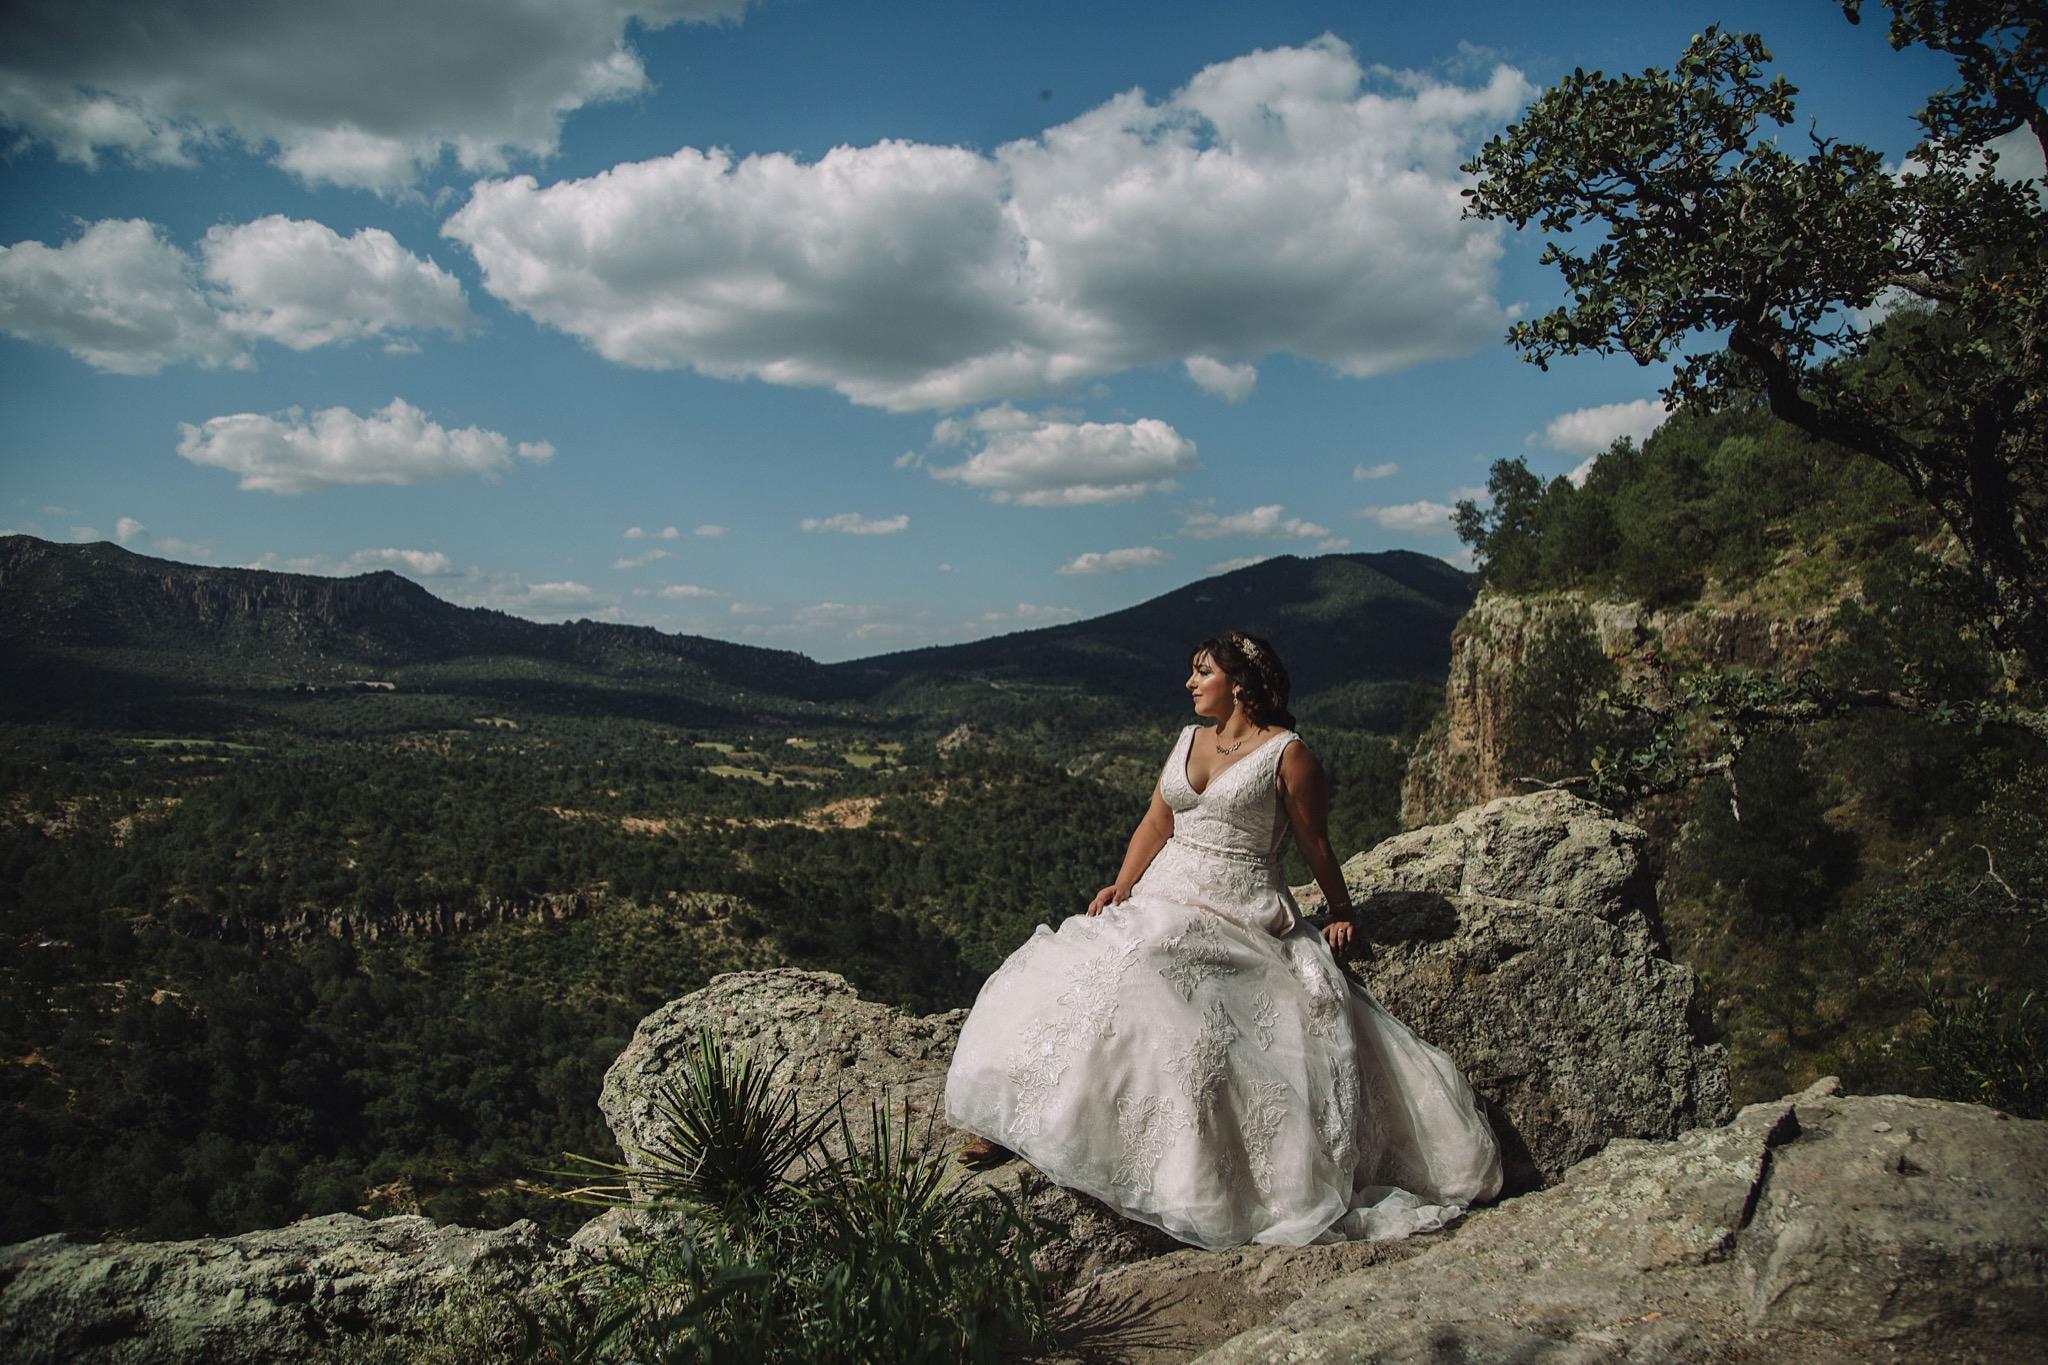 javier_noriega_fotografo_profesional_bodas_zacatecas_mexico_chihuahua_photographer_1